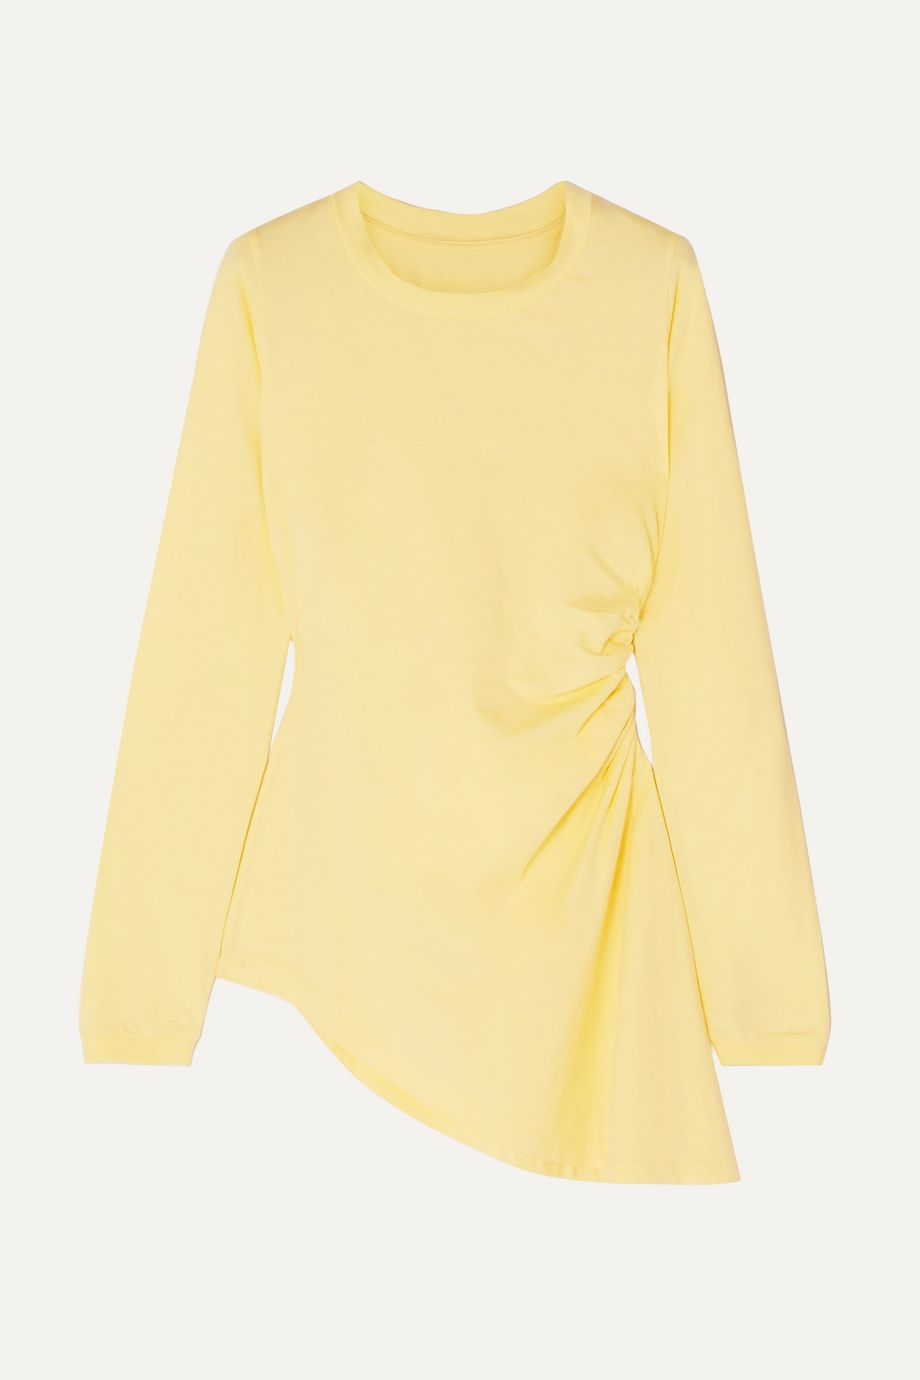 MM6 Maison Margiela Asymmetric ruched cotton-jersey top